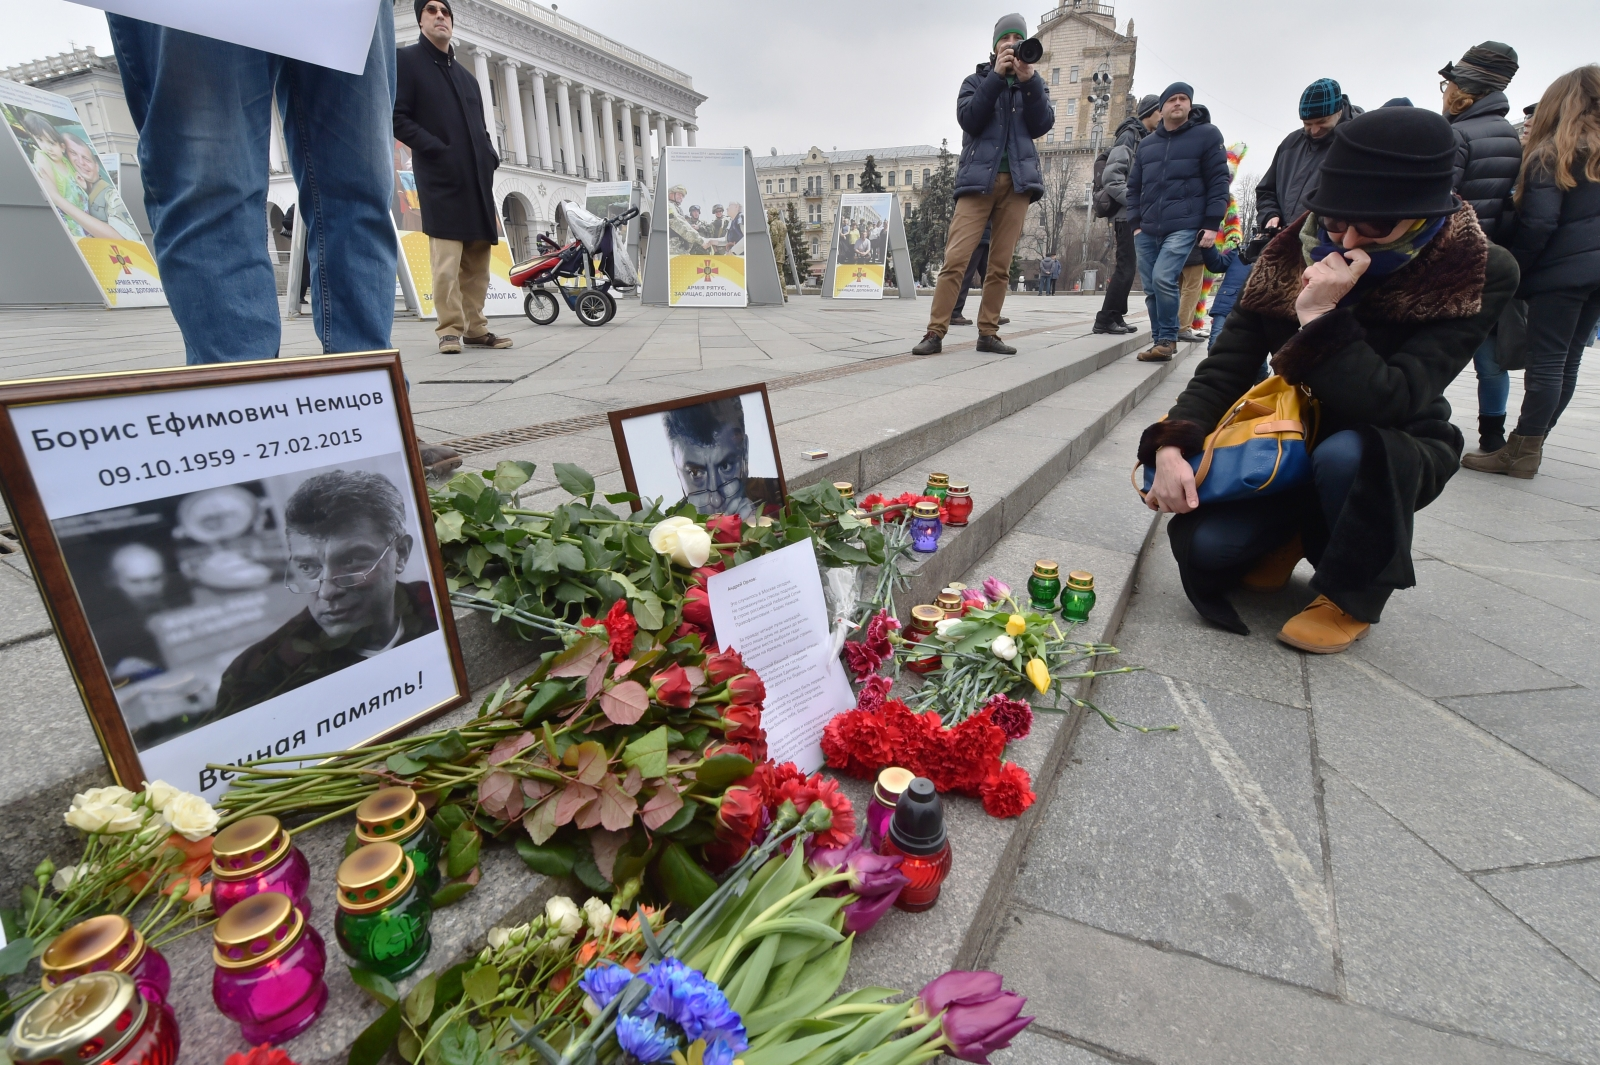 Tributes to Boris Nemtsov in Moscow